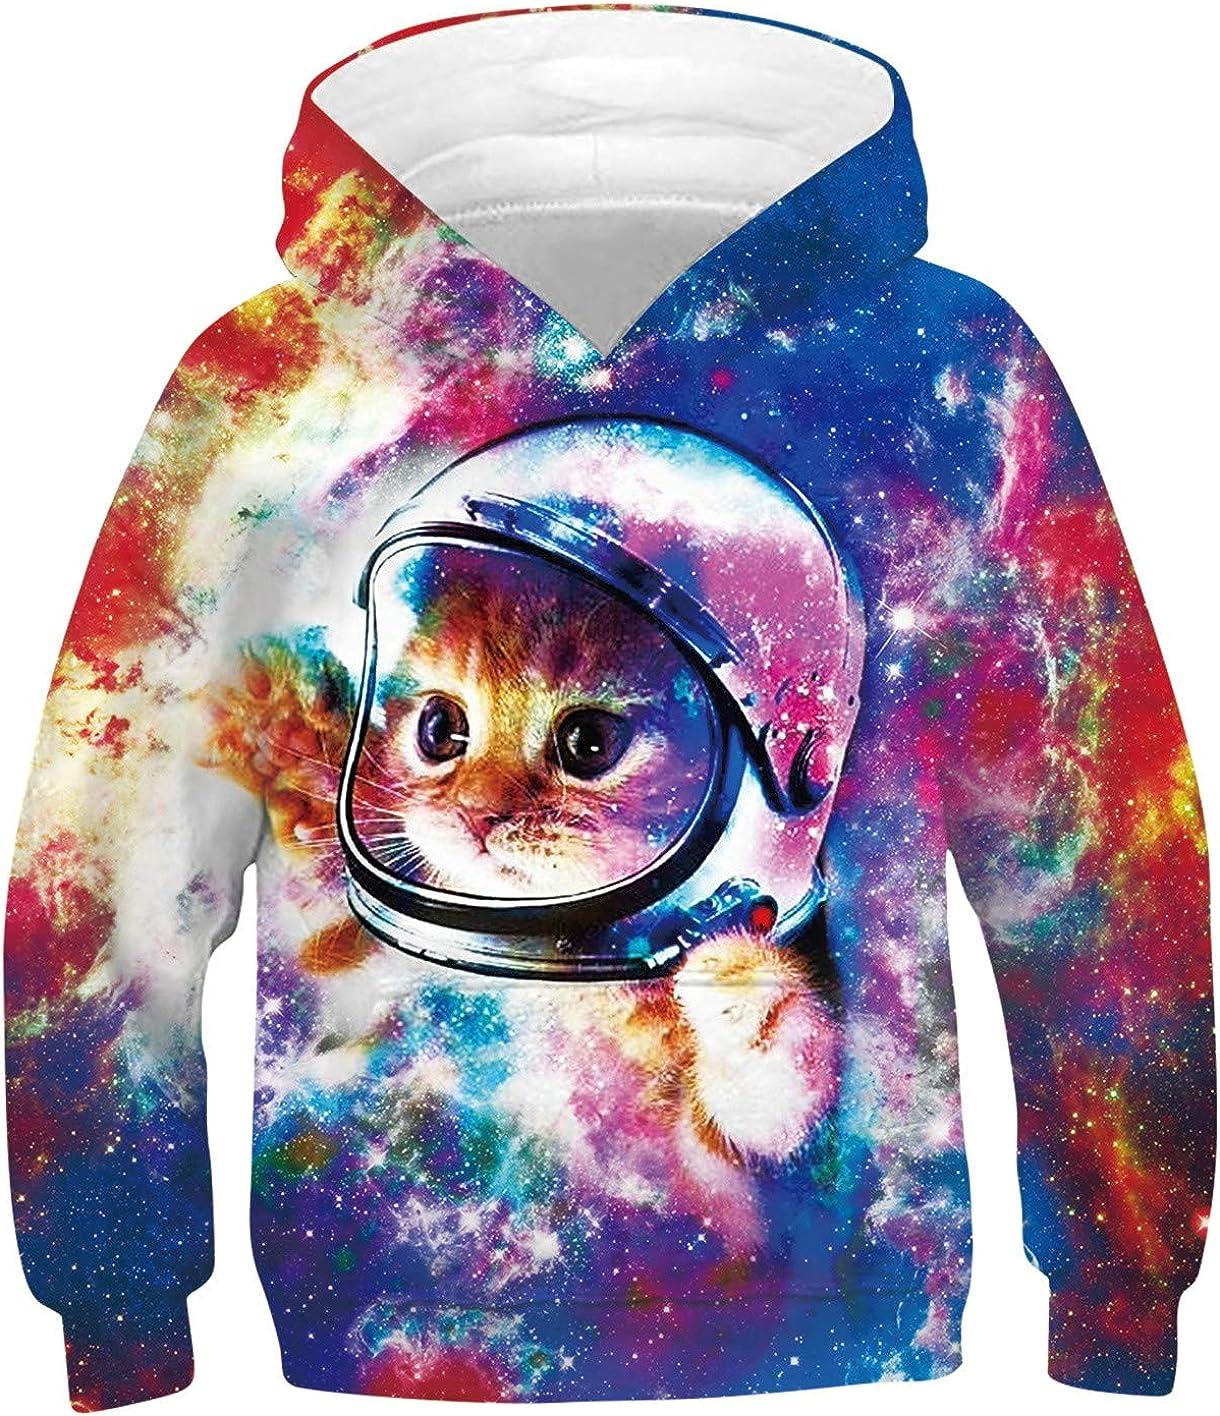 TUONROAD Kids Boys Girls Graphic Hoodies Shark Cat Pullover Sweatshirt Spring Fall Sweater Hoodie 6-16 Years